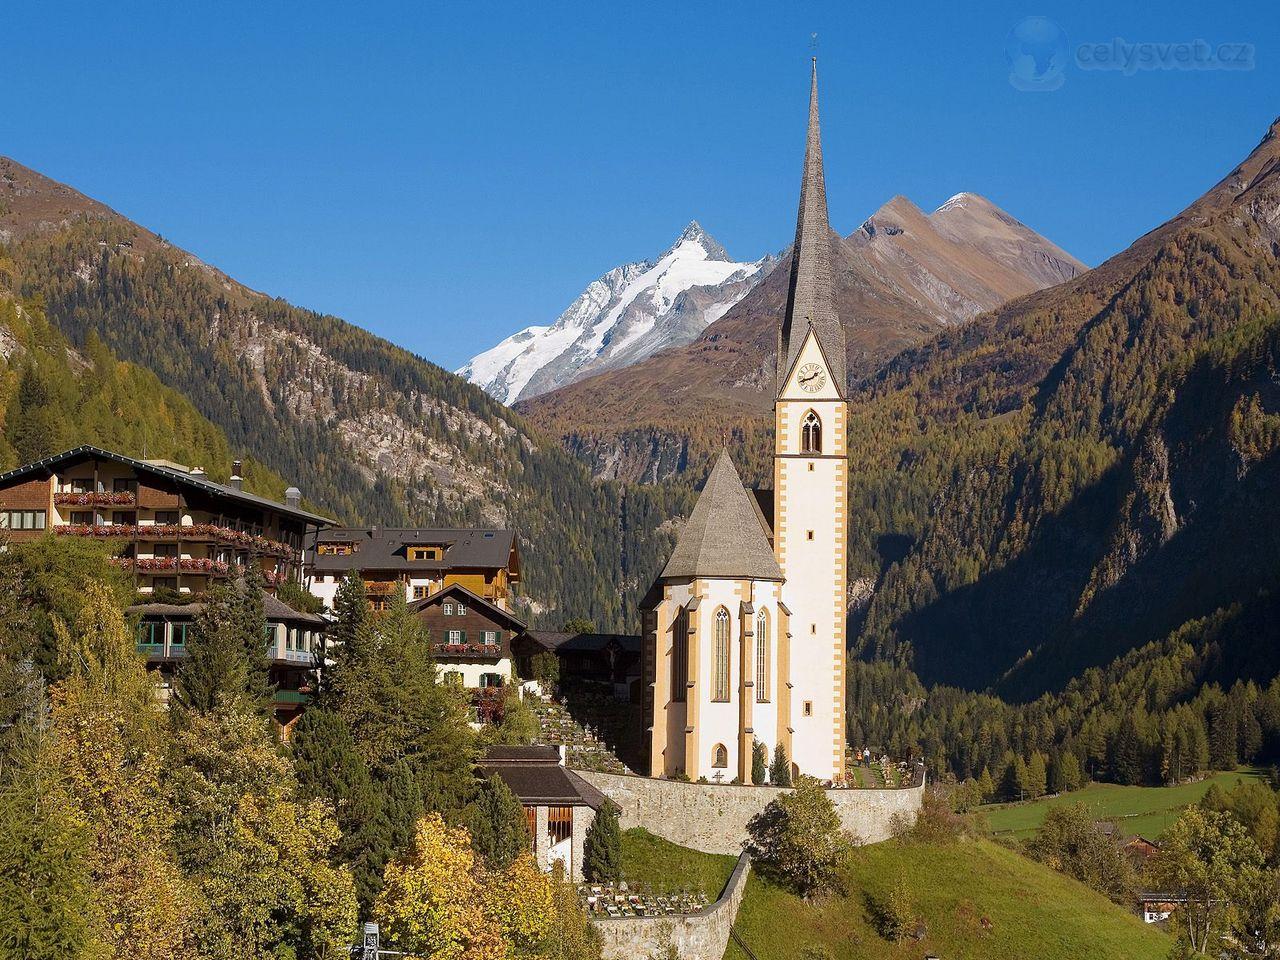 Heiligenblut Austria  city pictures gallery : ... Alpách, Rakousko / Heiligenblut Village In High Alps, Austria